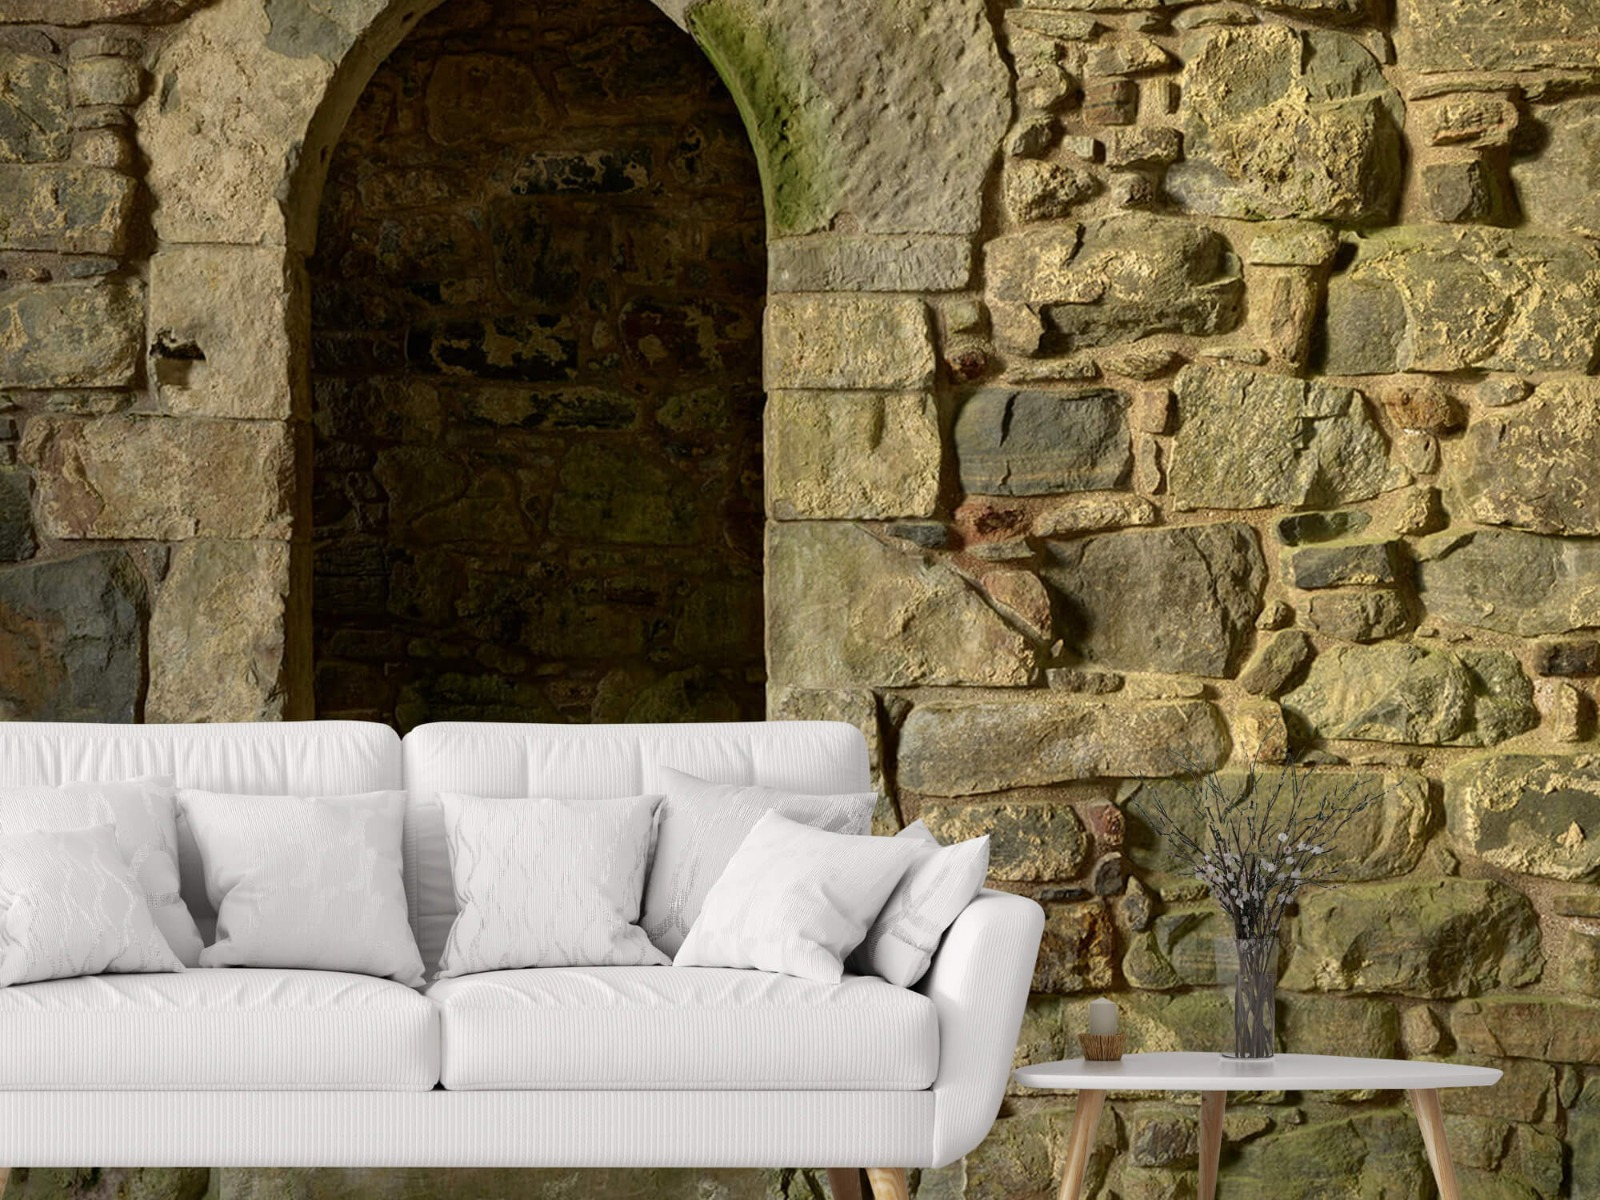 Steen behang - Oude muur met doorgang - Slaapkamer 3